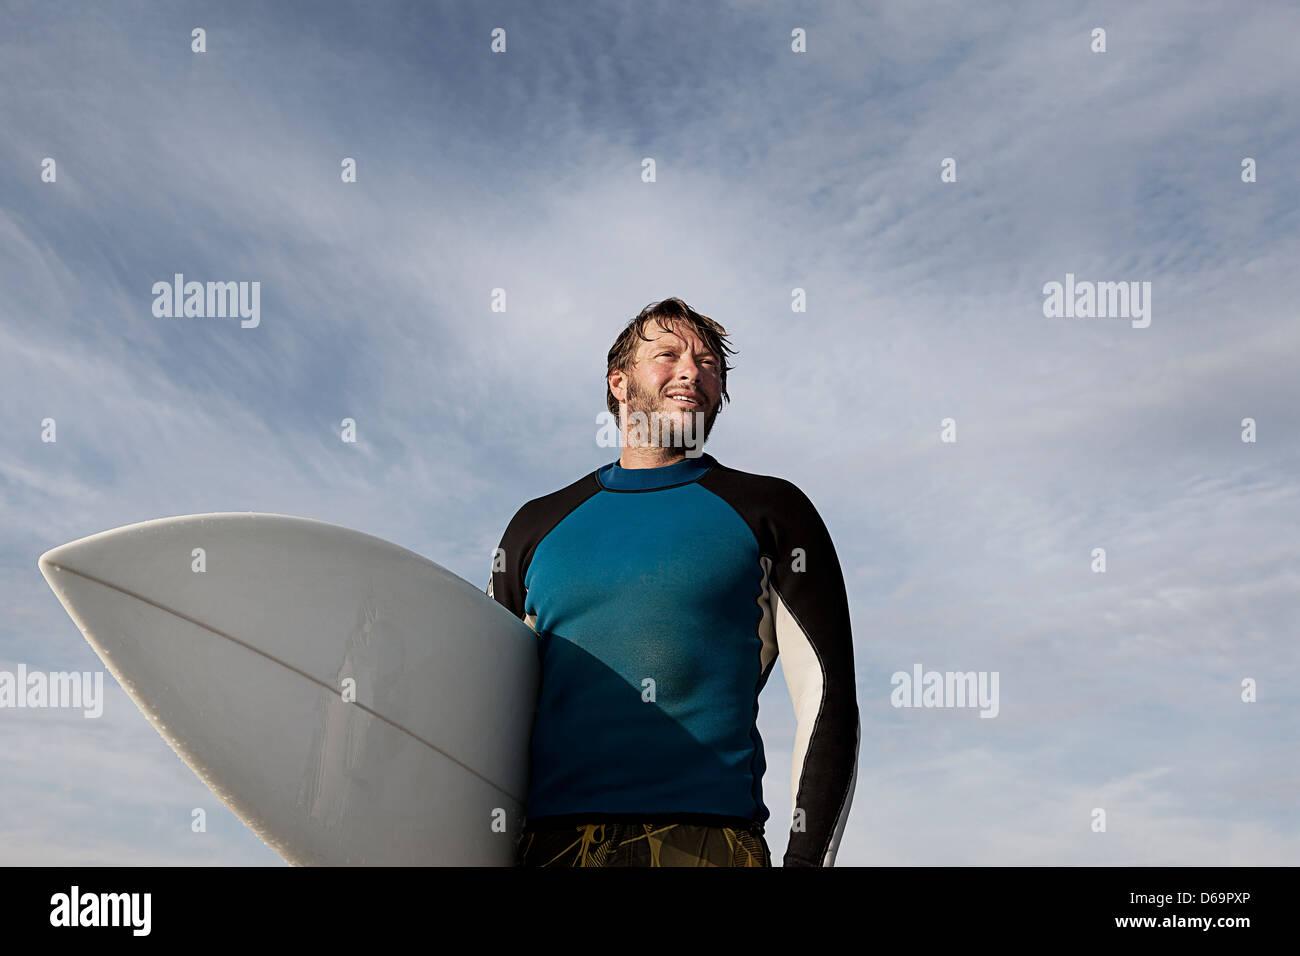 Surfer mit Board im freien Stockbild